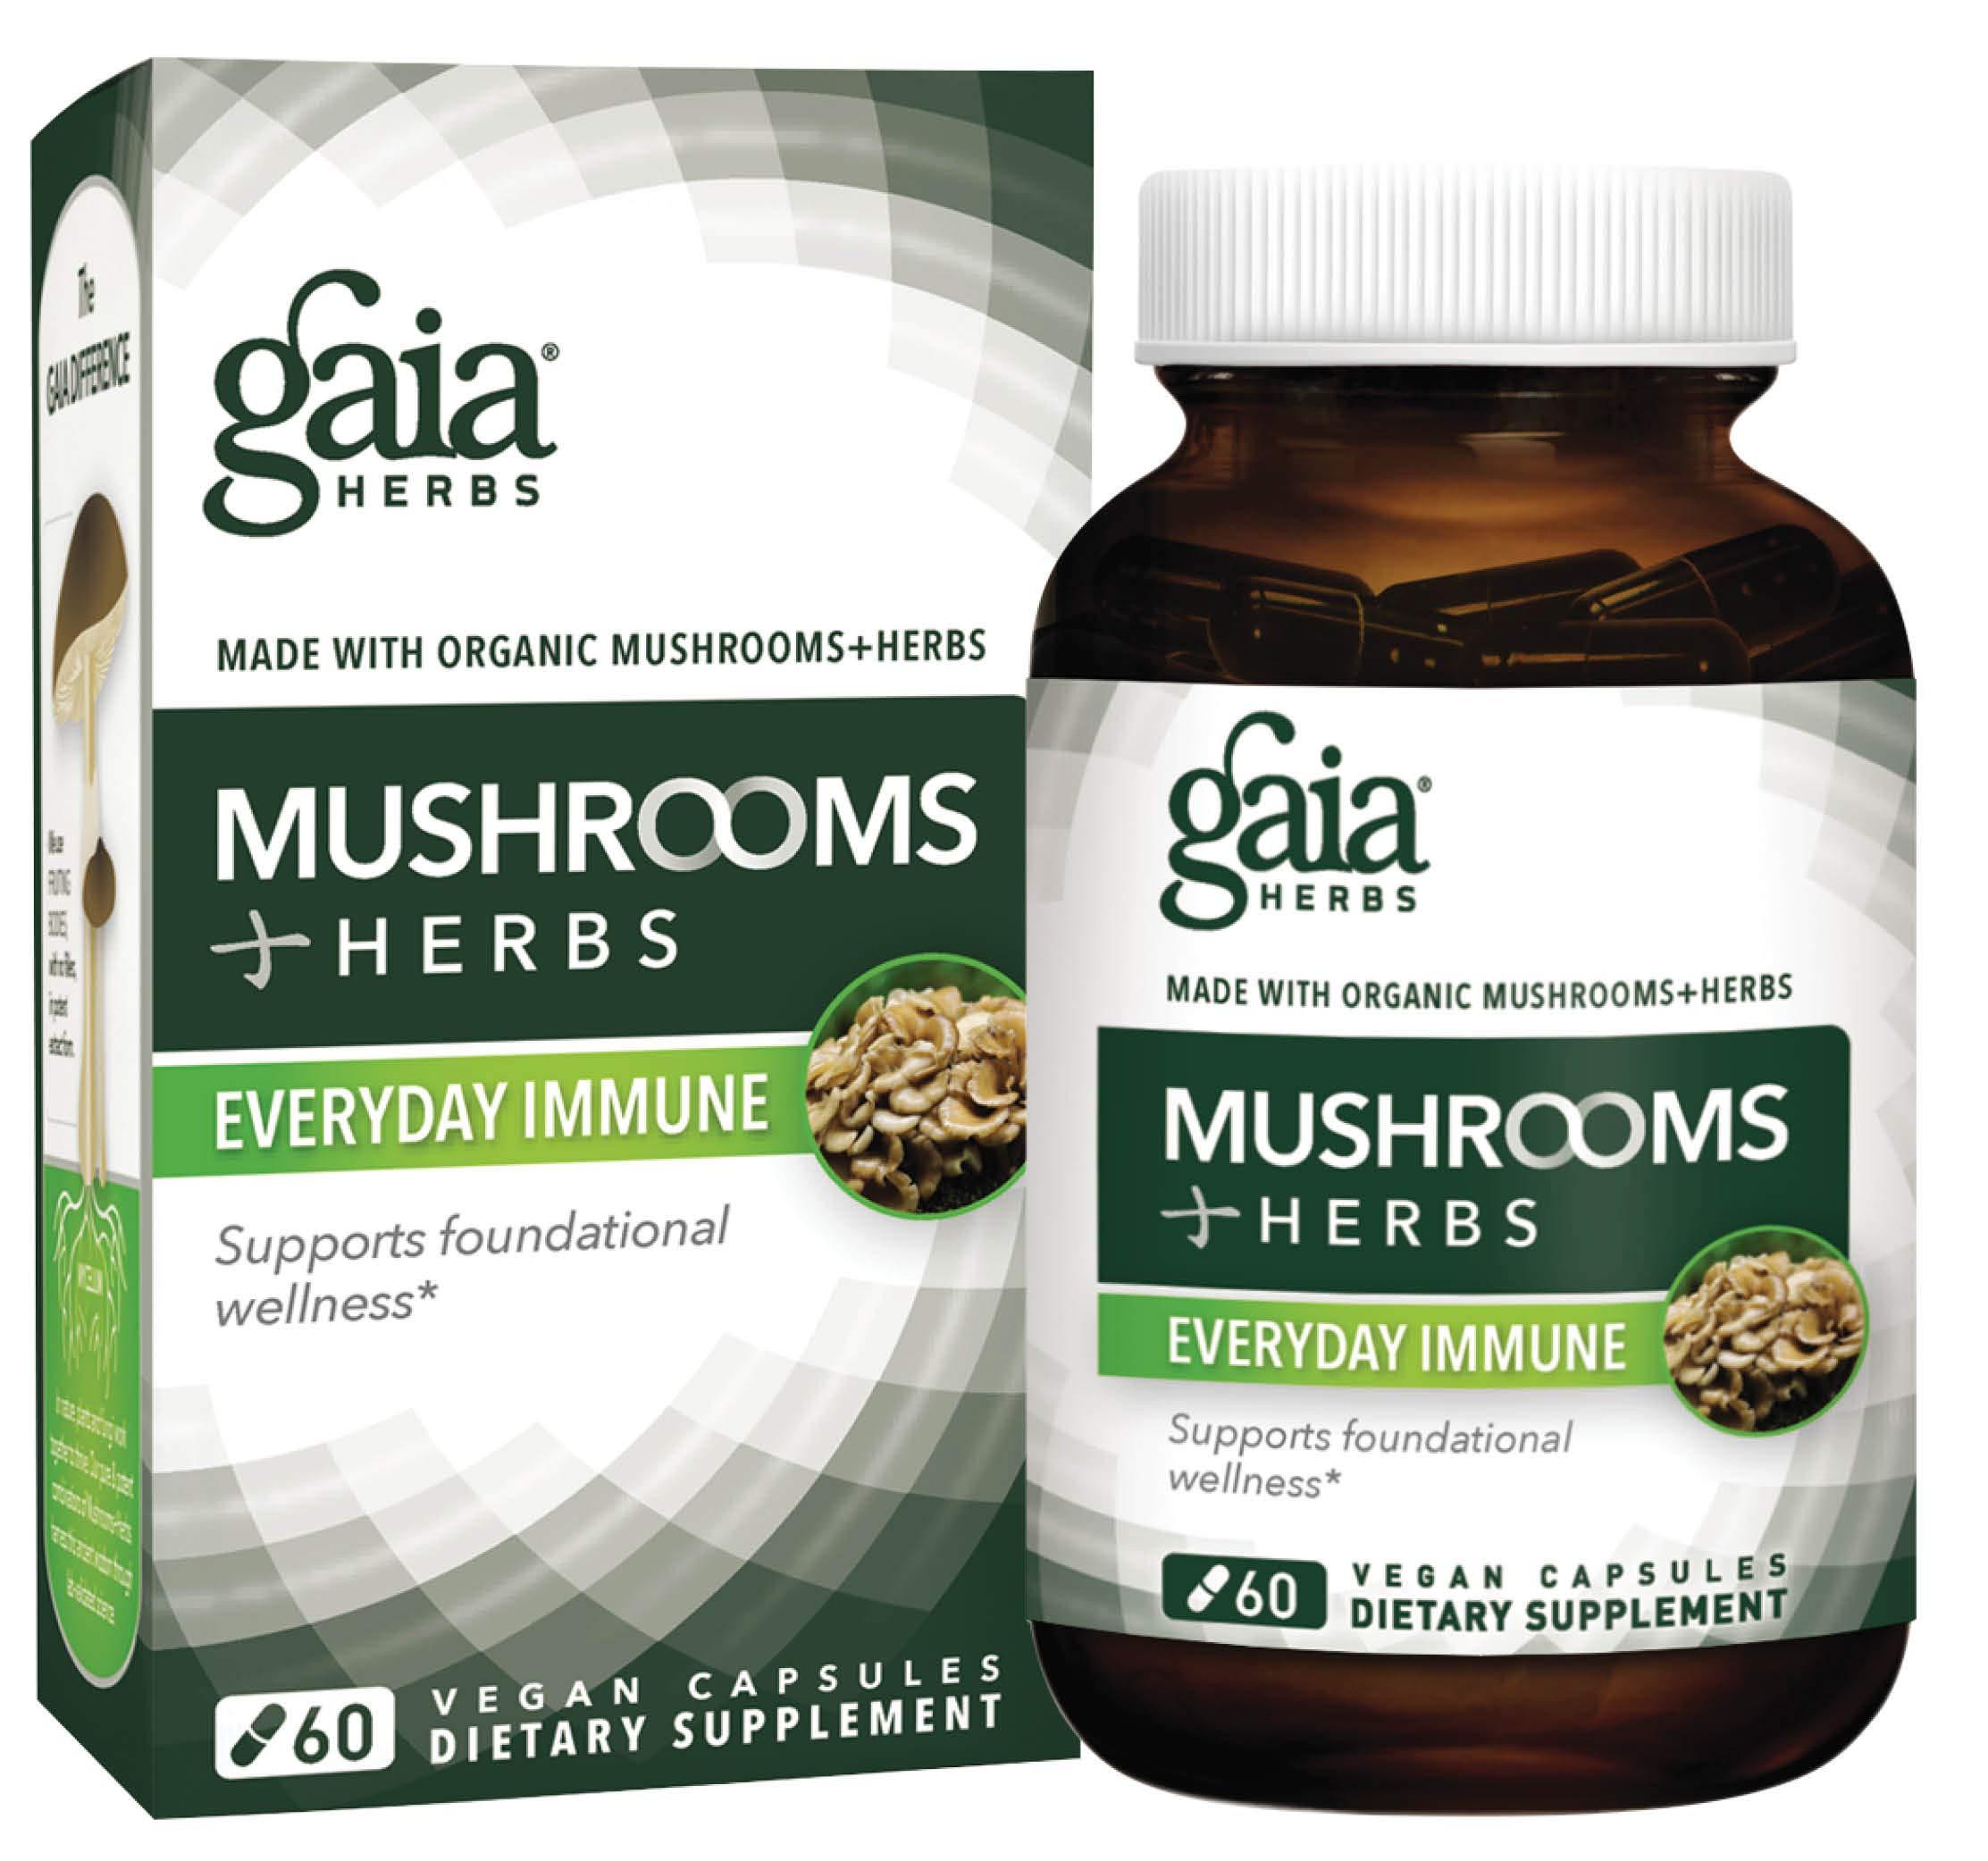 Gaia Herbs Mushrooms + Herbs Everyday Immune, Vegan Liquid Capsules, 60 Count - Whole Body Immune and Daily Wellness Formula, Organic Reishi, Cordyceps, Turmeric (Curcumins), Astragalus